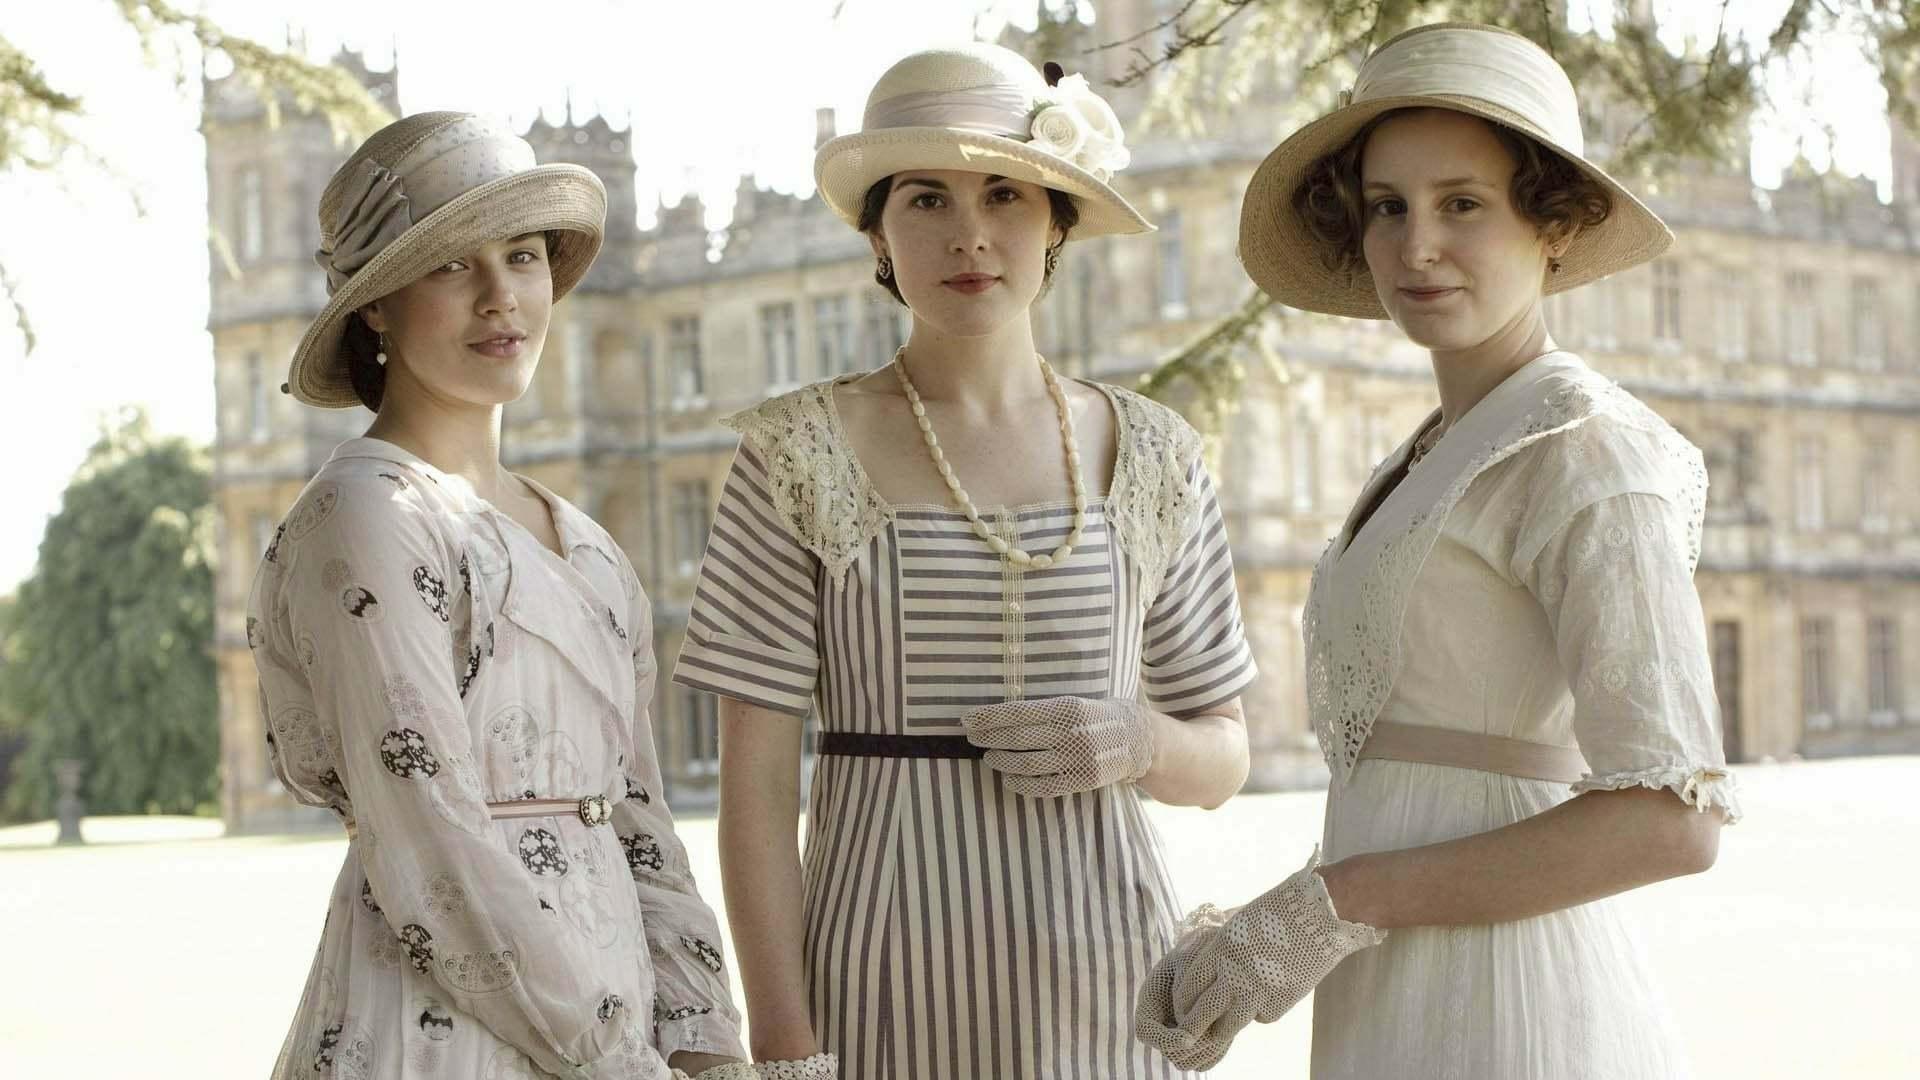 Кадры из фильма Аббатство Даунтон Downton Abbey 2010